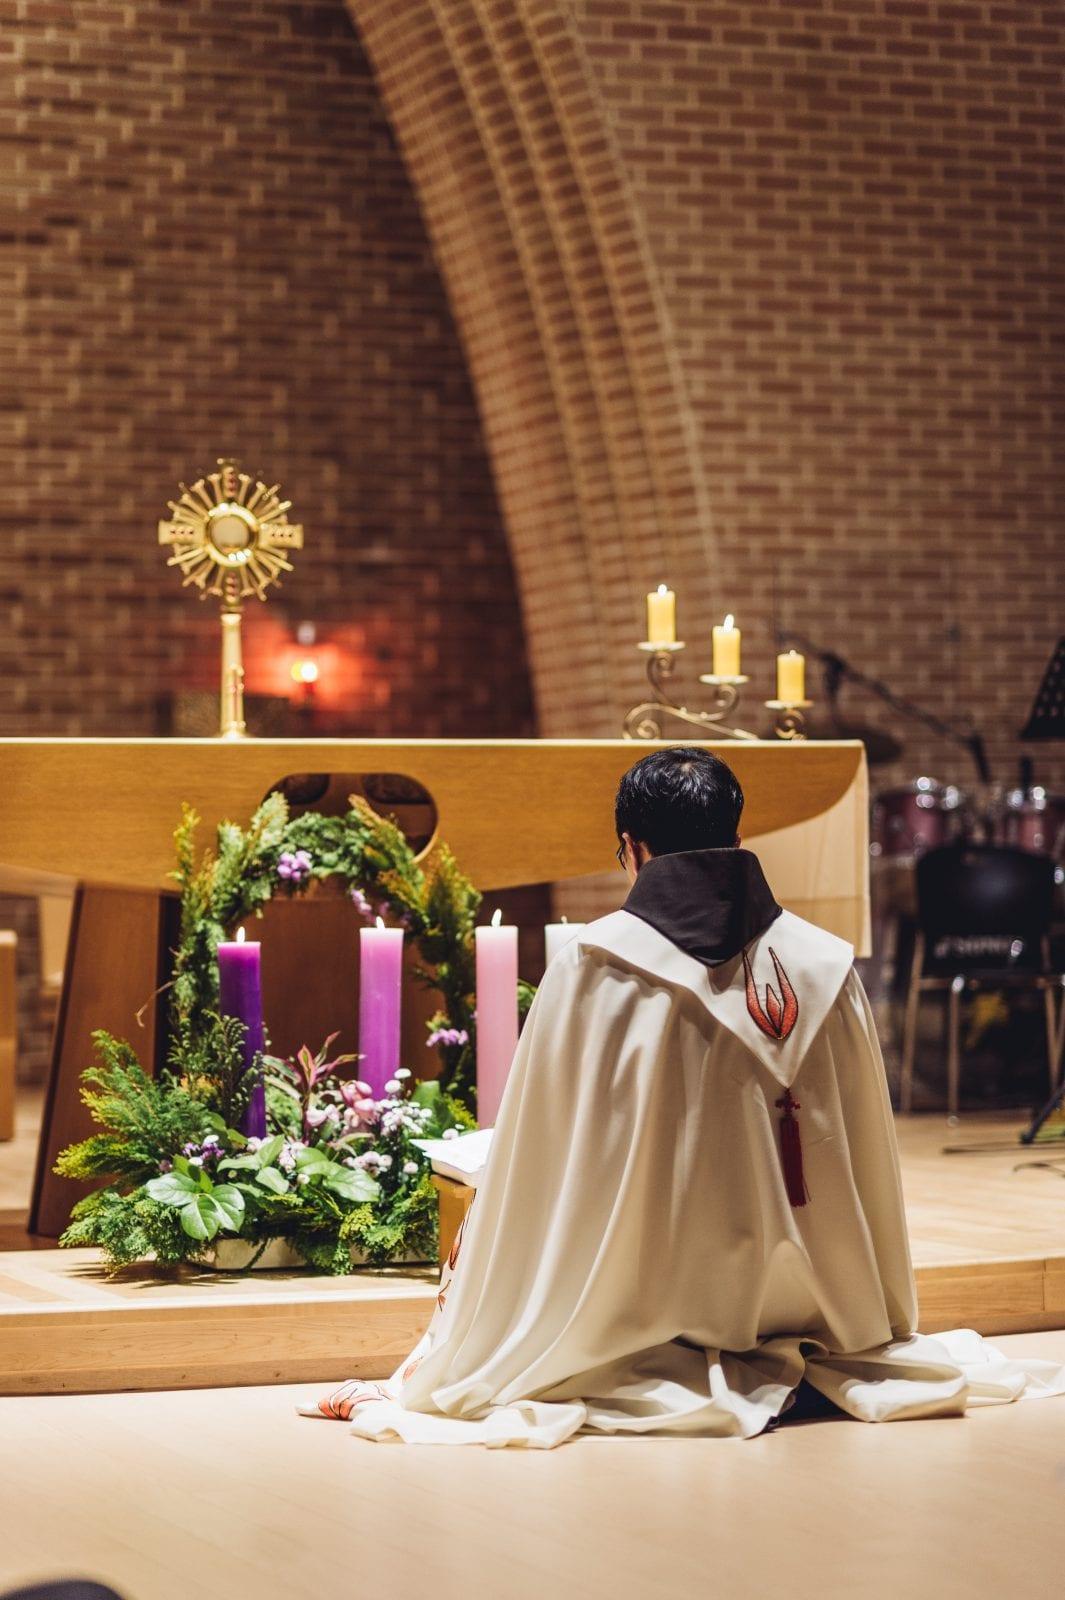 Redescubriendo al Padre Ignacio Scheifler, S. J. imagen